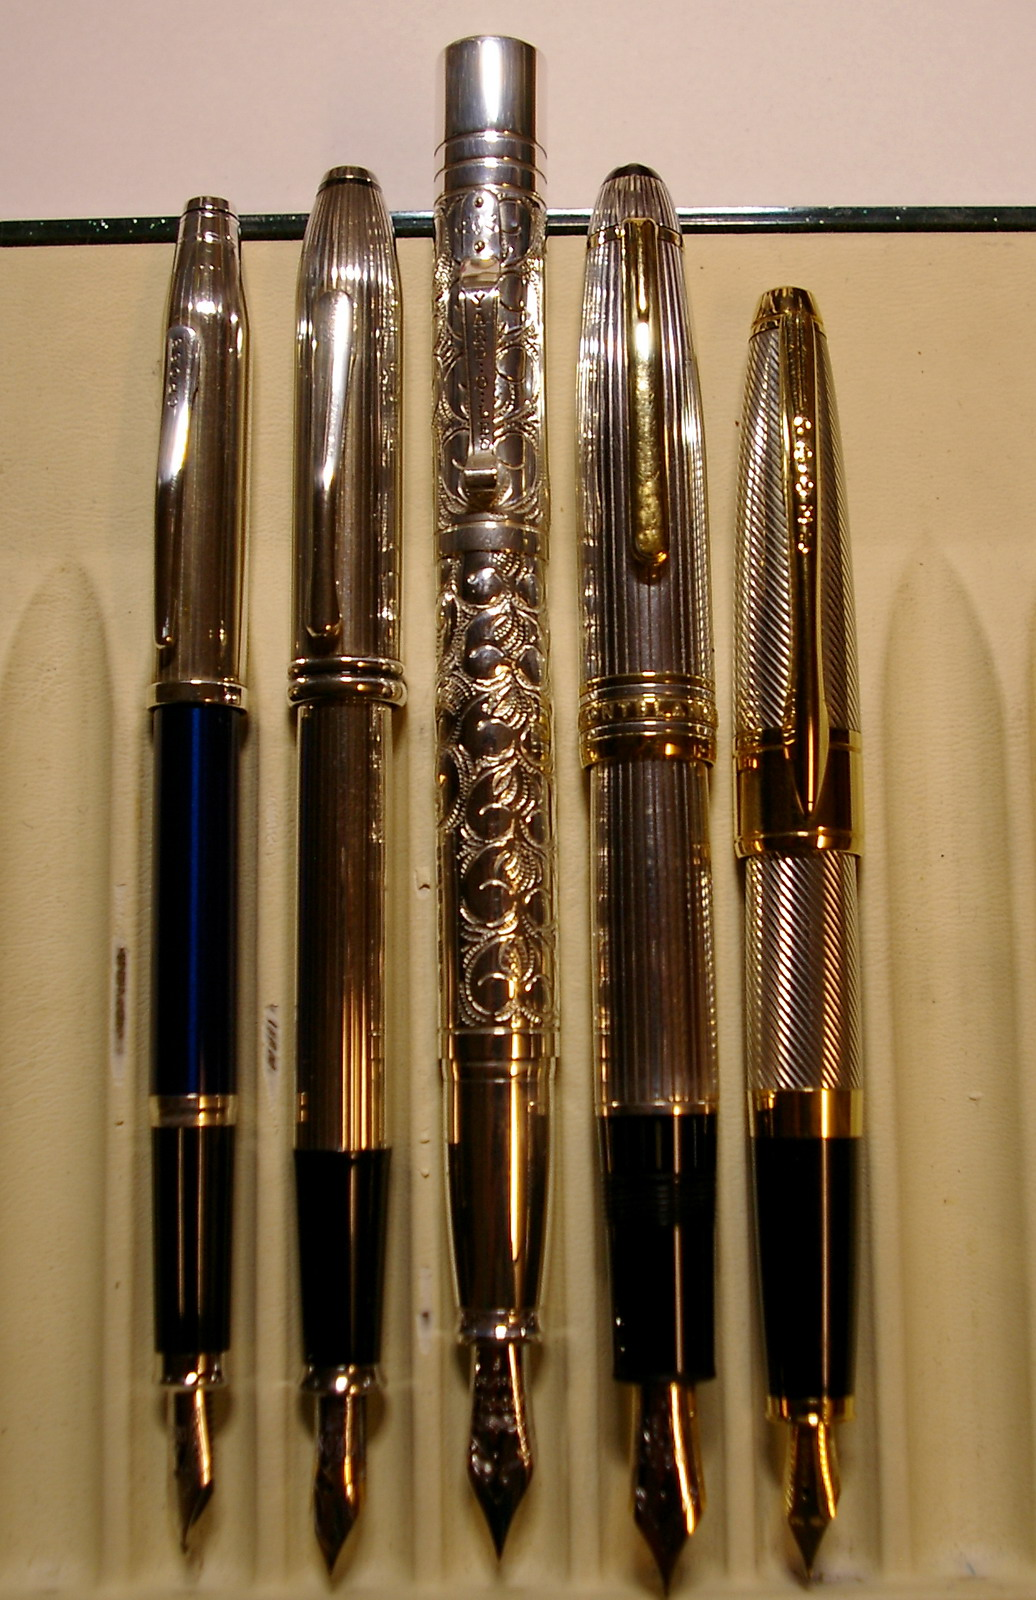 fpn_1496008058__silver_pens_2.jpg